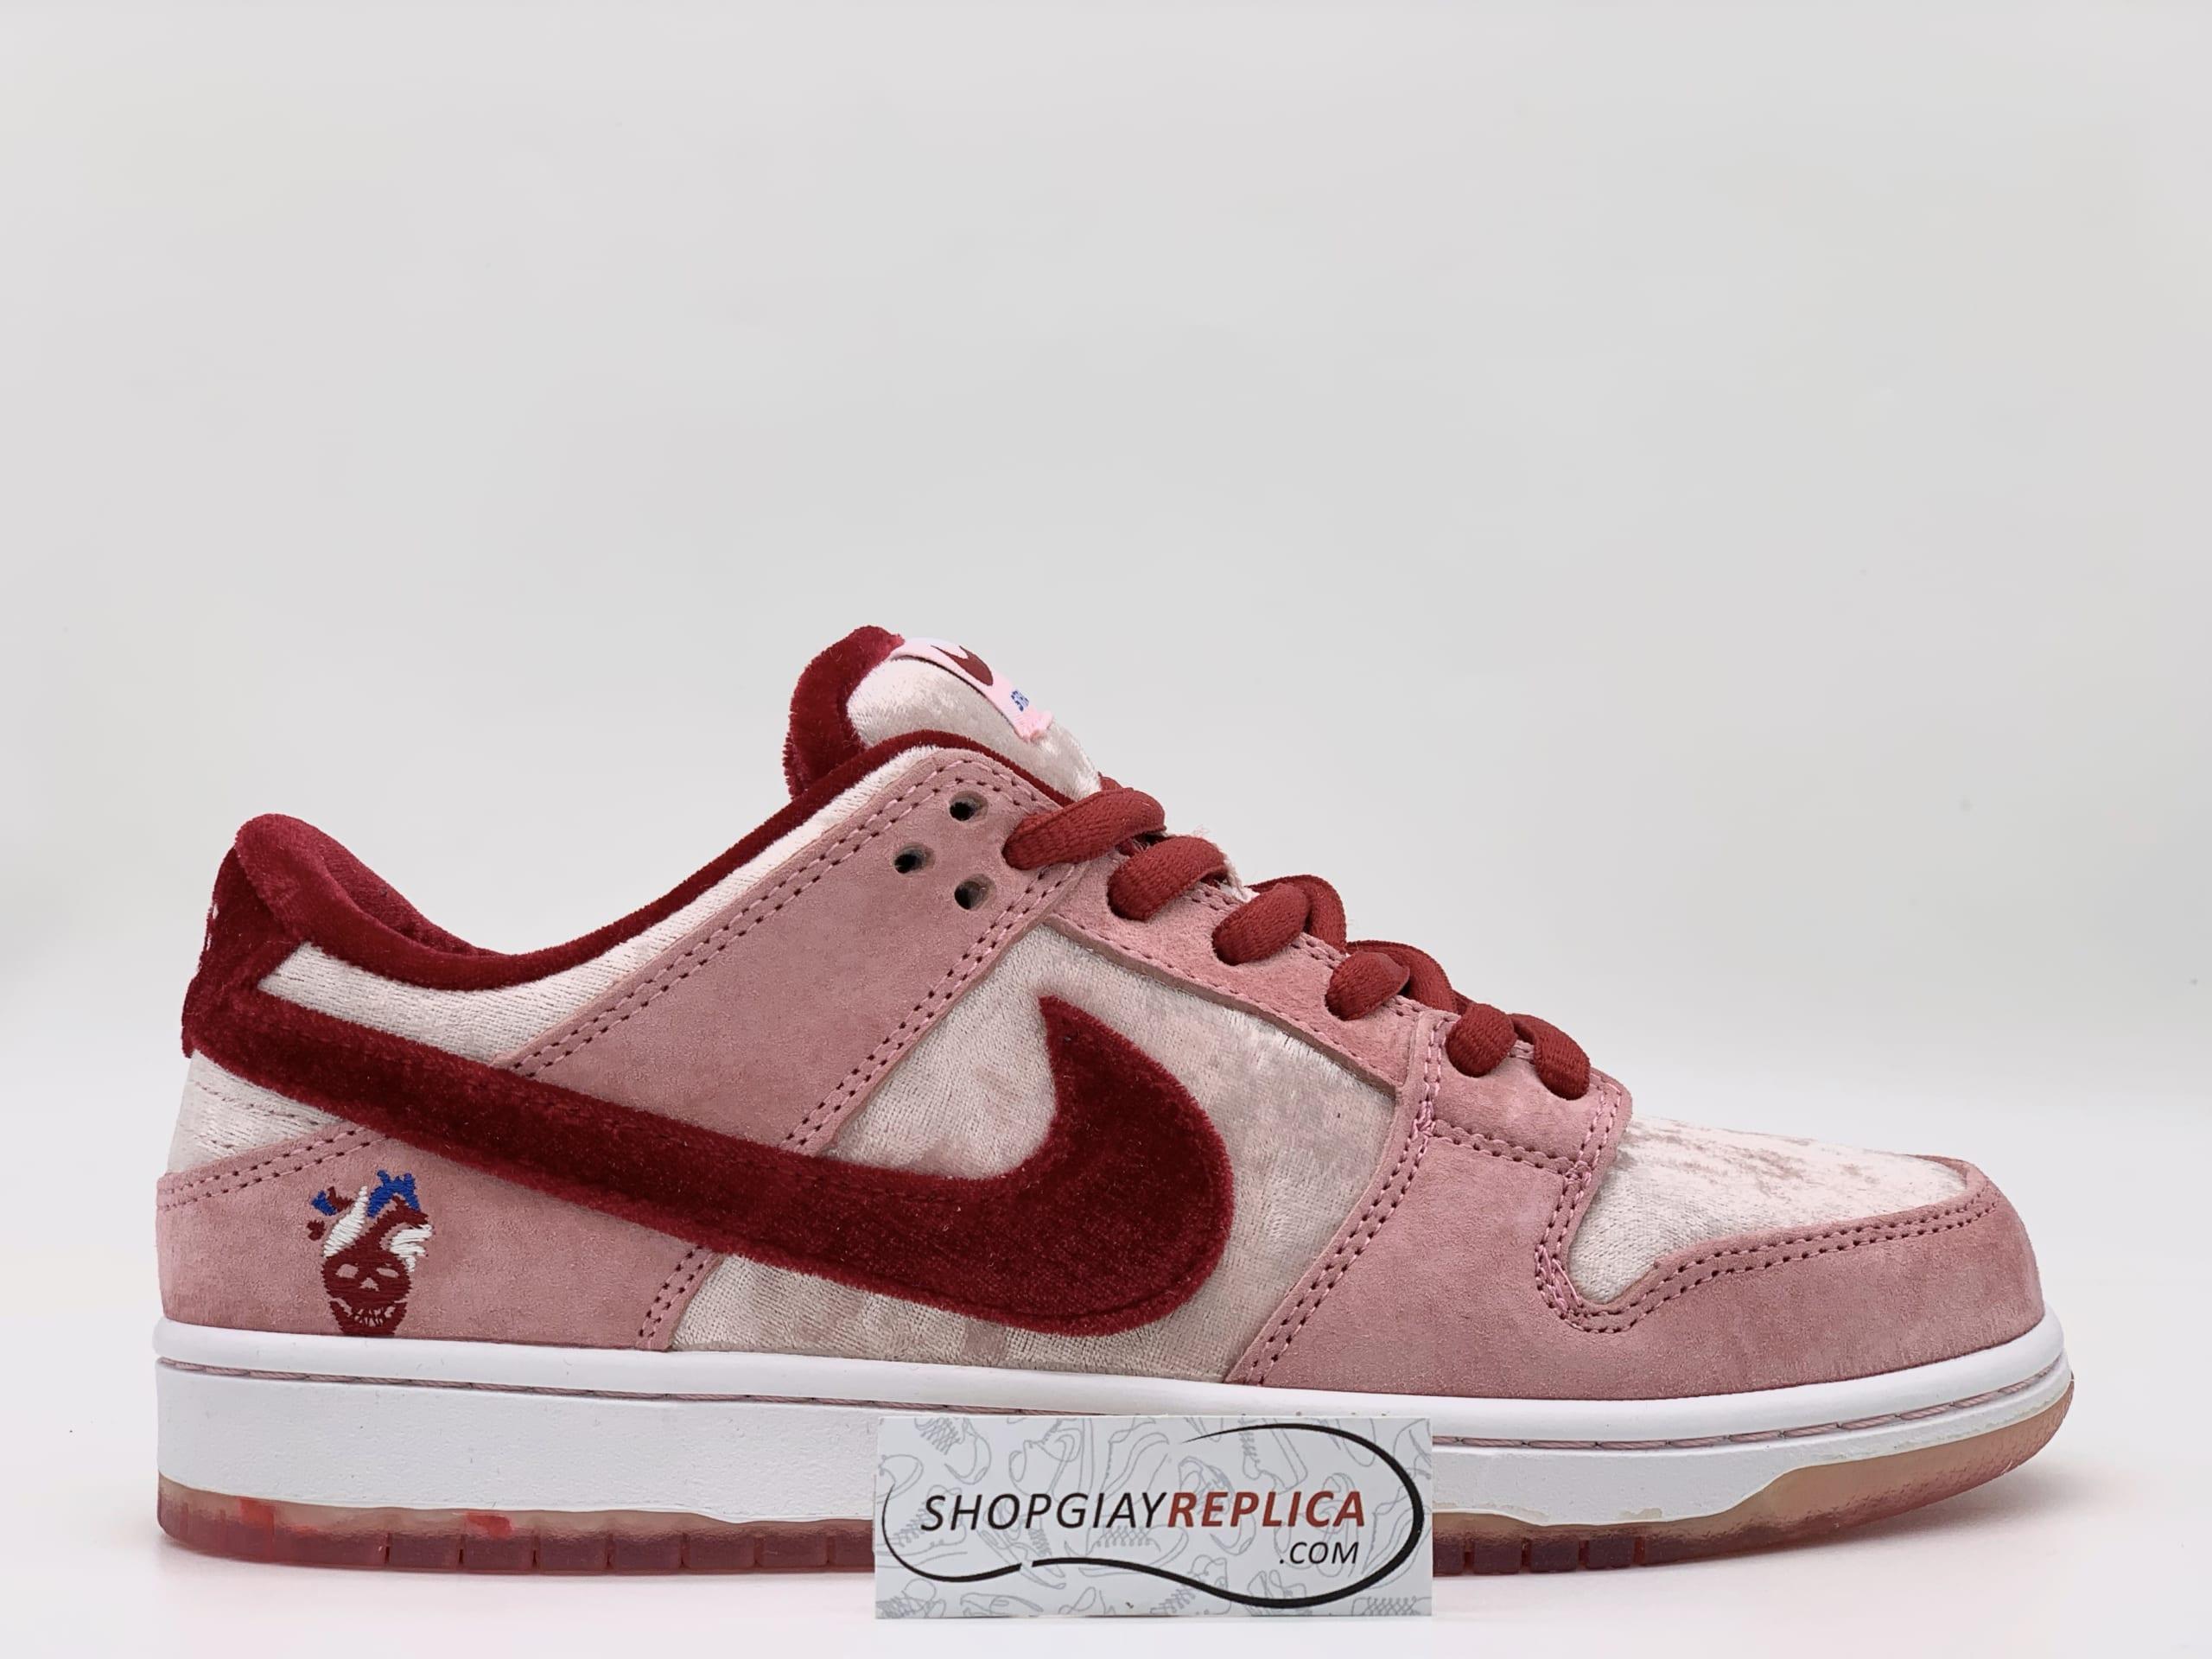 Nike SB Dunk Low StrangeLove replica 1:1